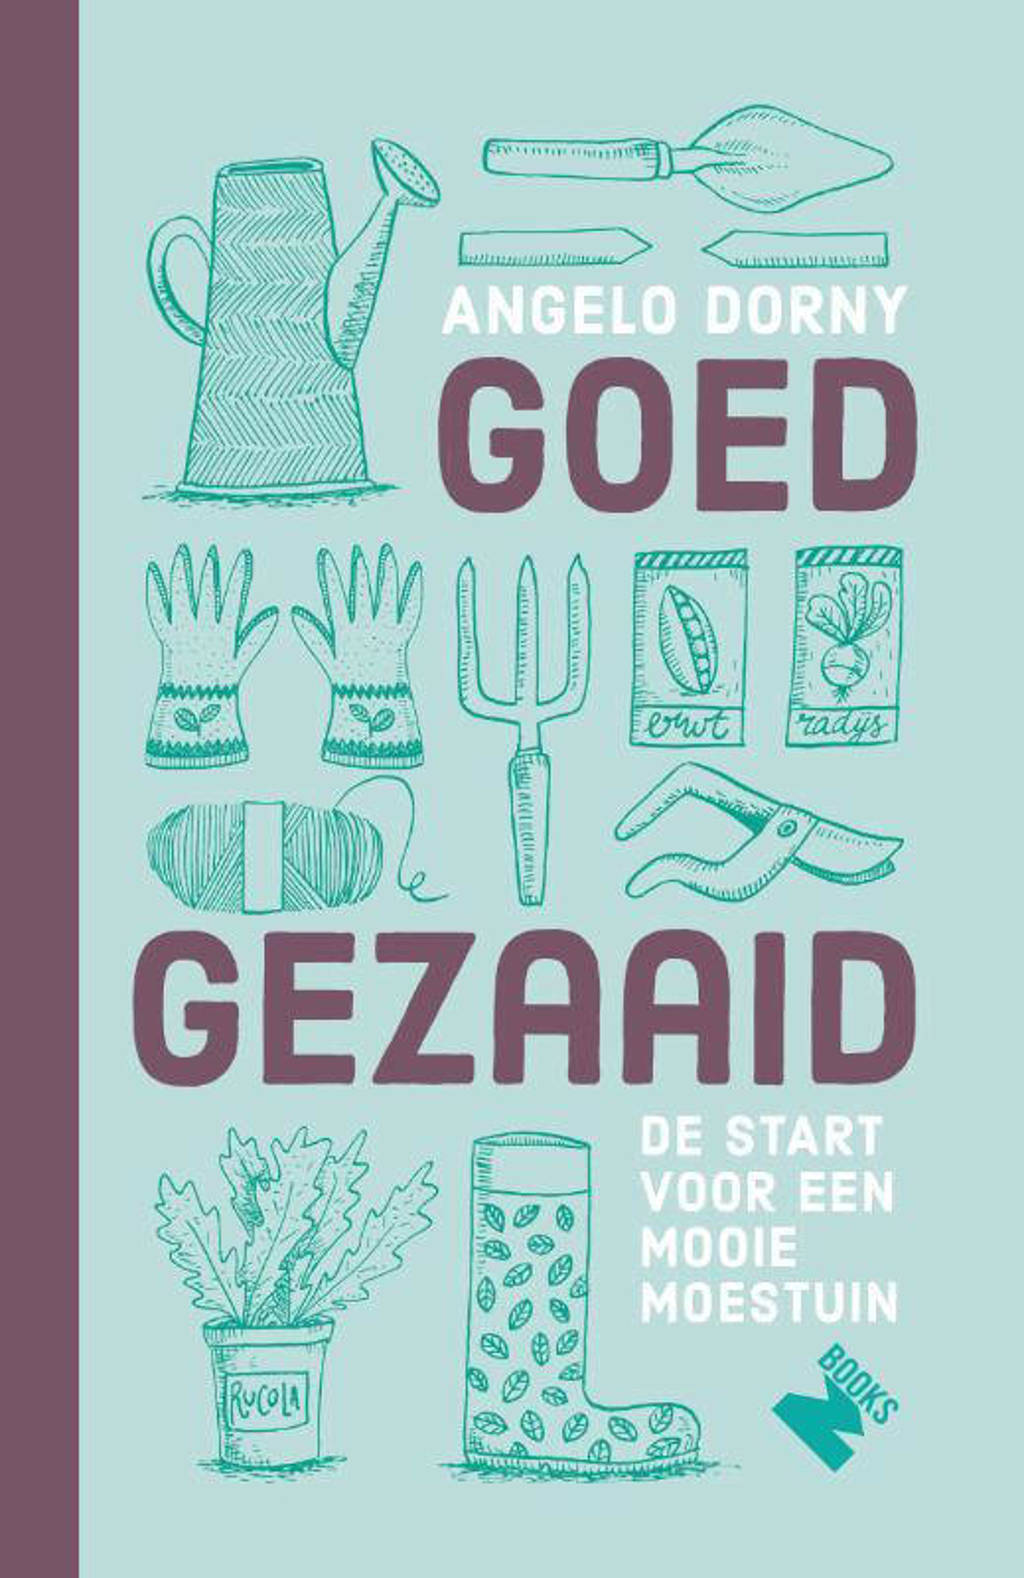 Goed gezaaid - Angelo Dorny